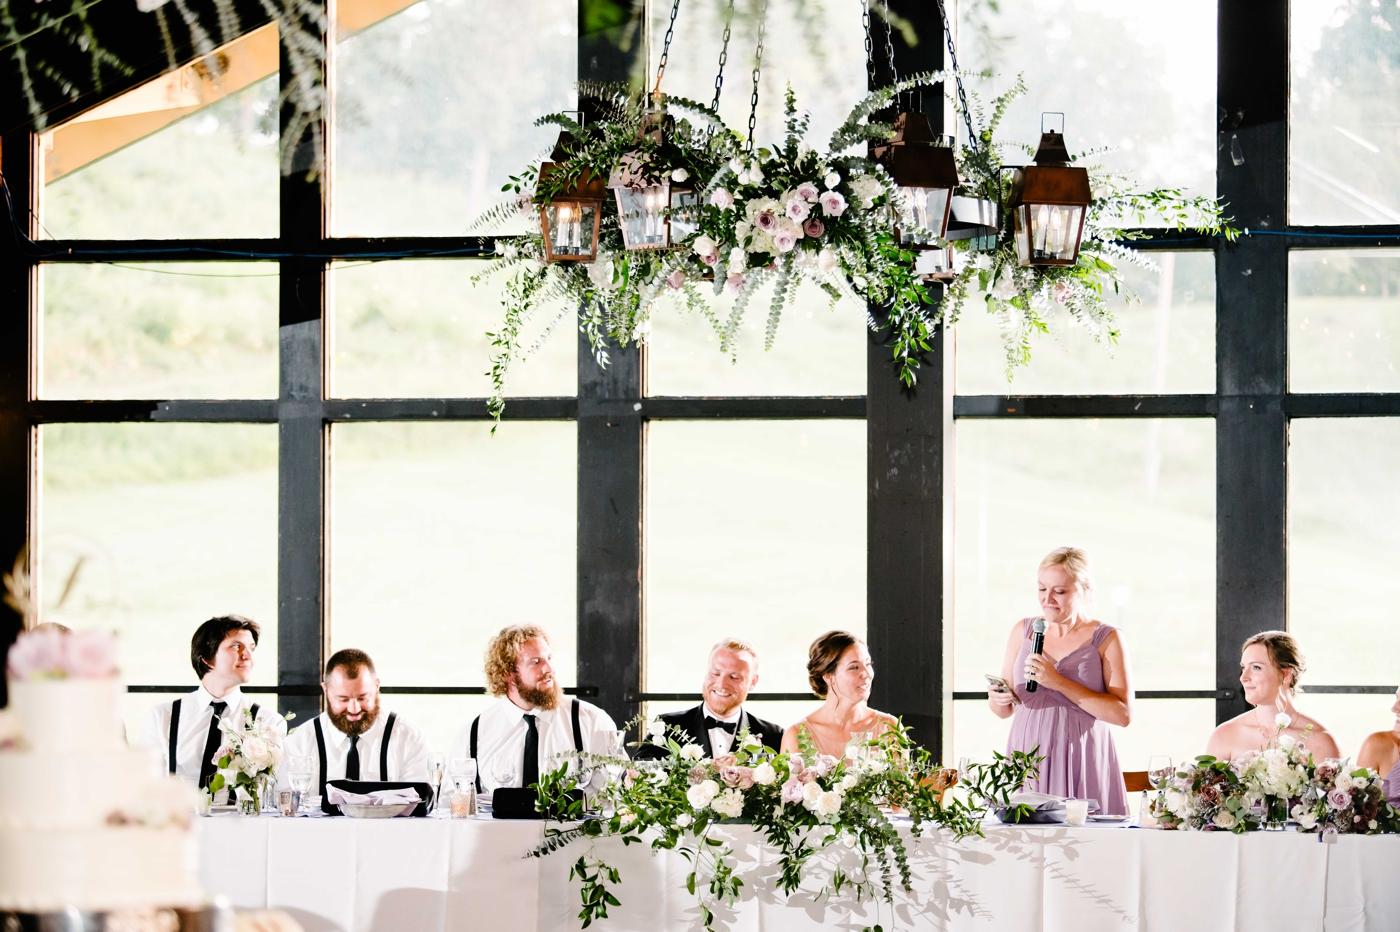 chicago-fine-art-wedding-photography-zuidema51